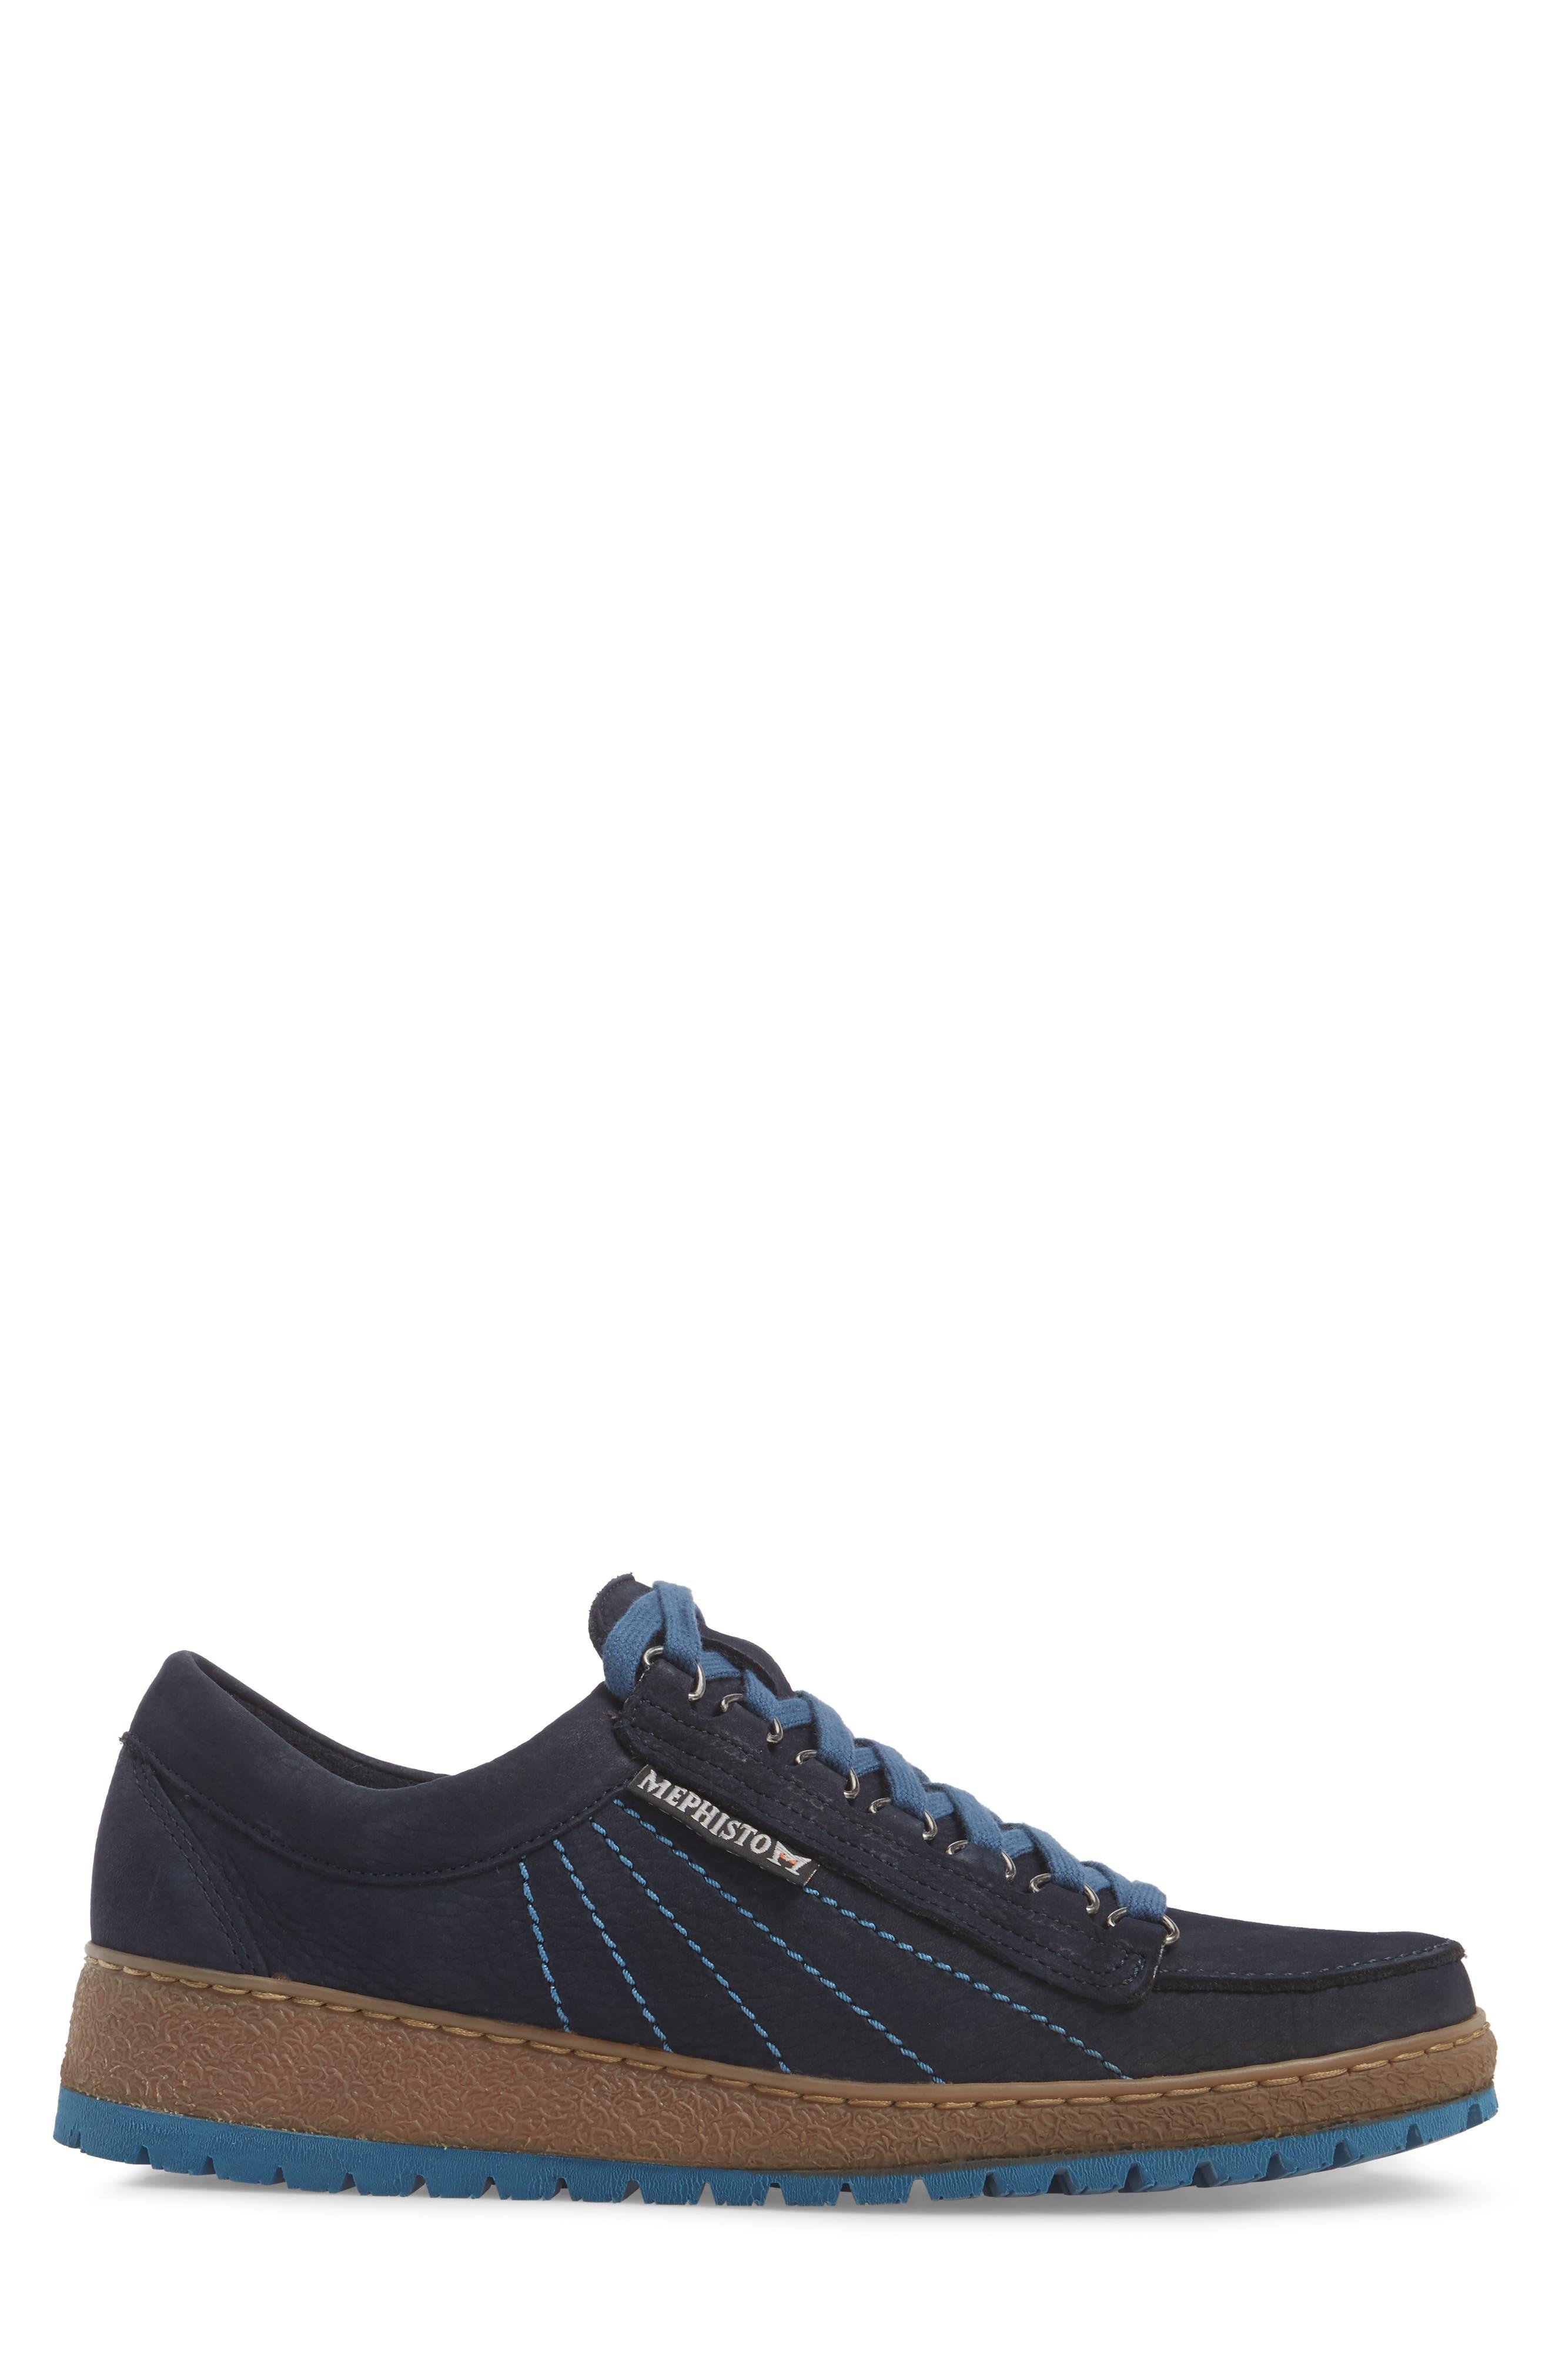 Rainbow Sneaker,                             Alternate thumbnail 3, color,                             NAVY BLUE SUEDE